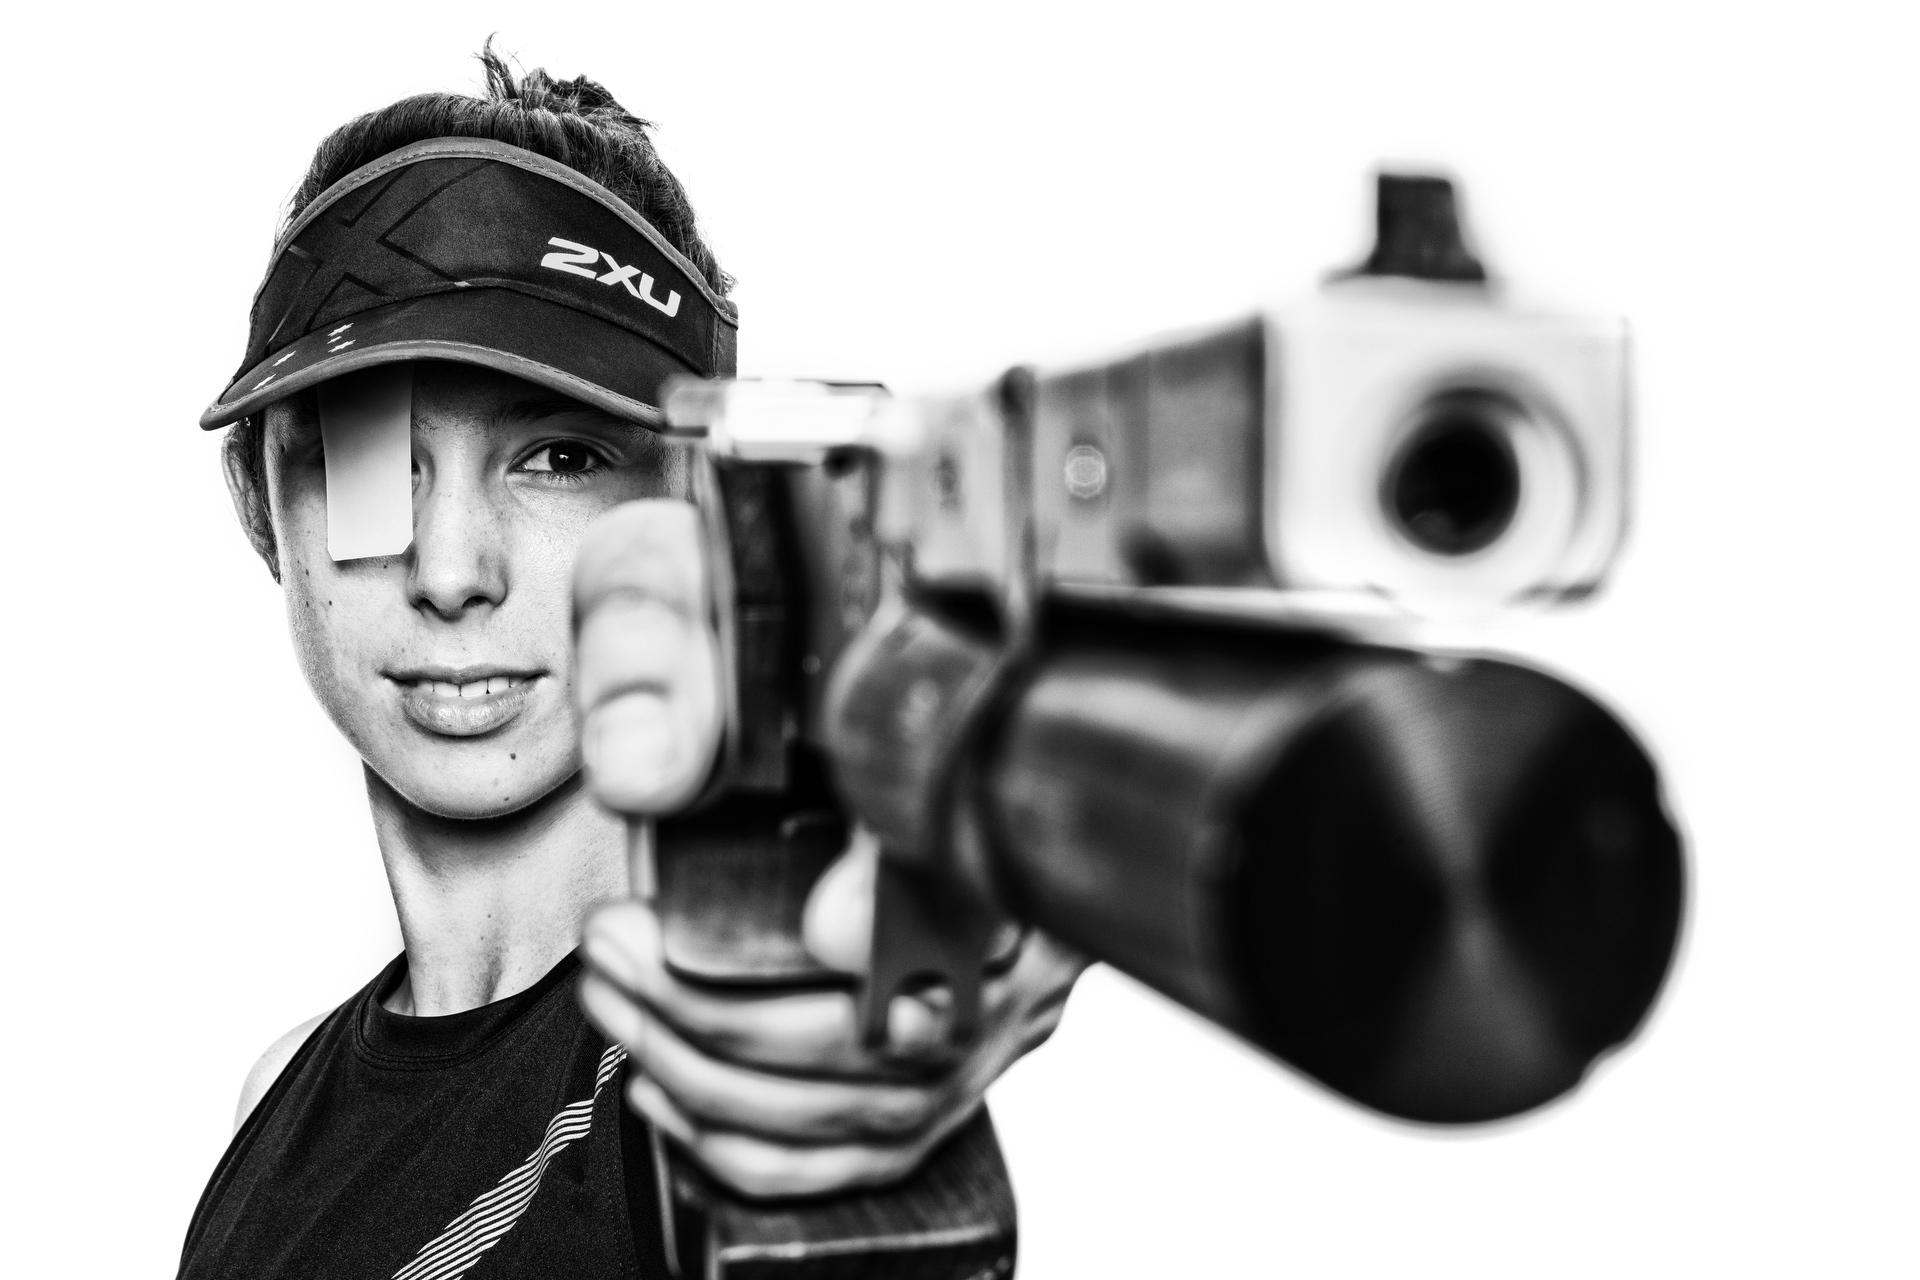 Sydney portrait photographer, personal branding, head shots, corporate photography, Olympics, modern pentathlon, shooting